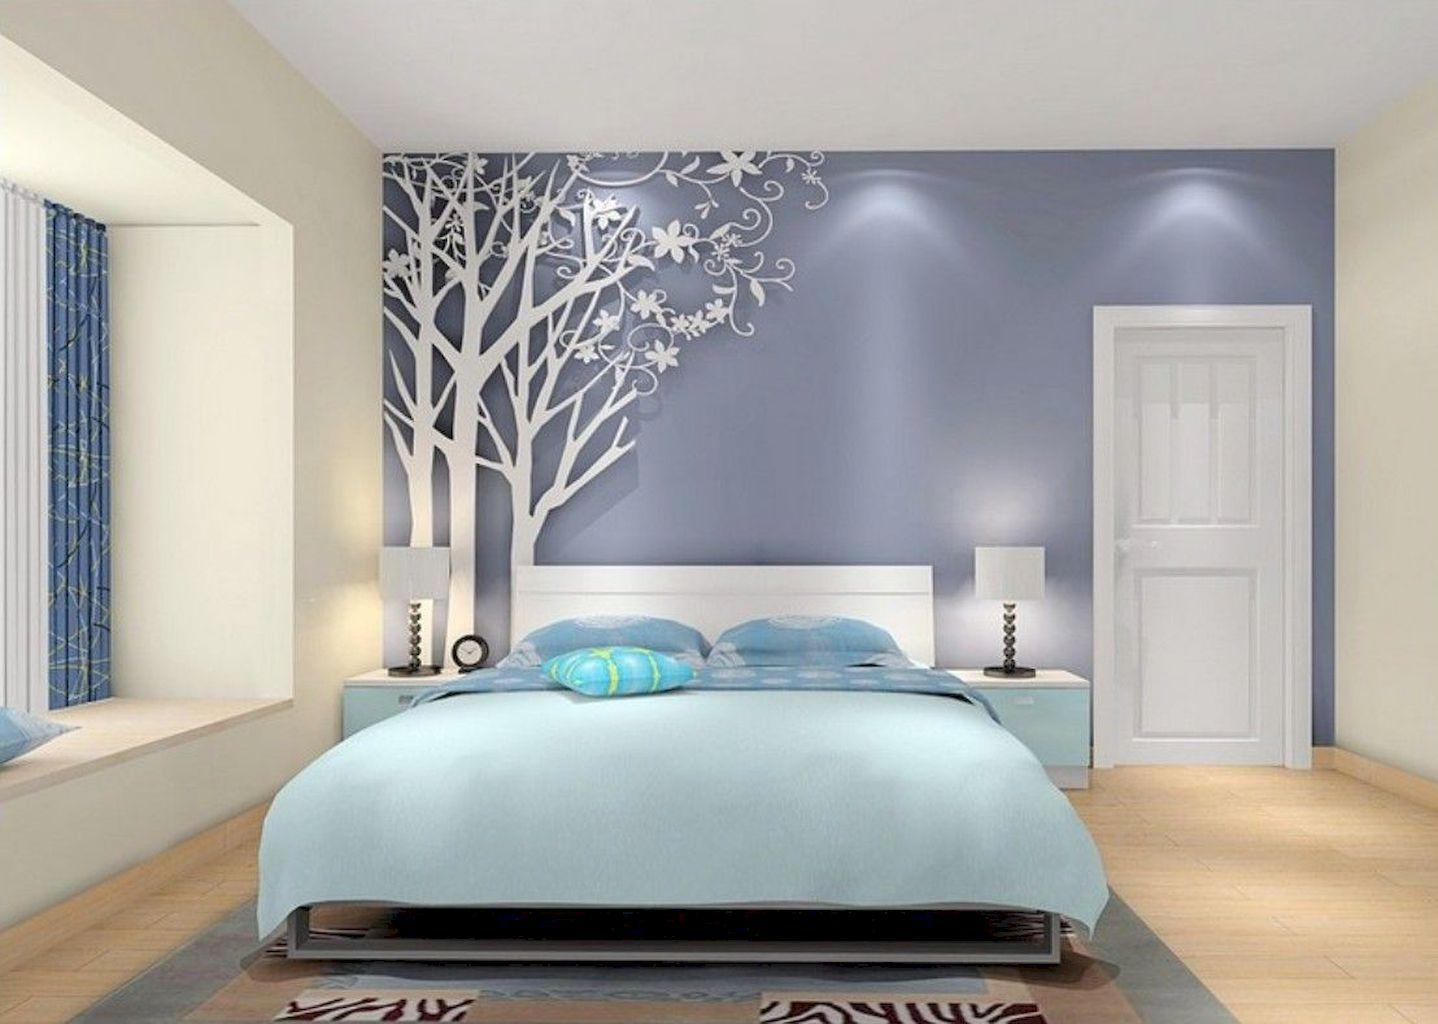 200 fabulously transform bedroom decor for romantic on romantic trend master bedroom ideas id=46981